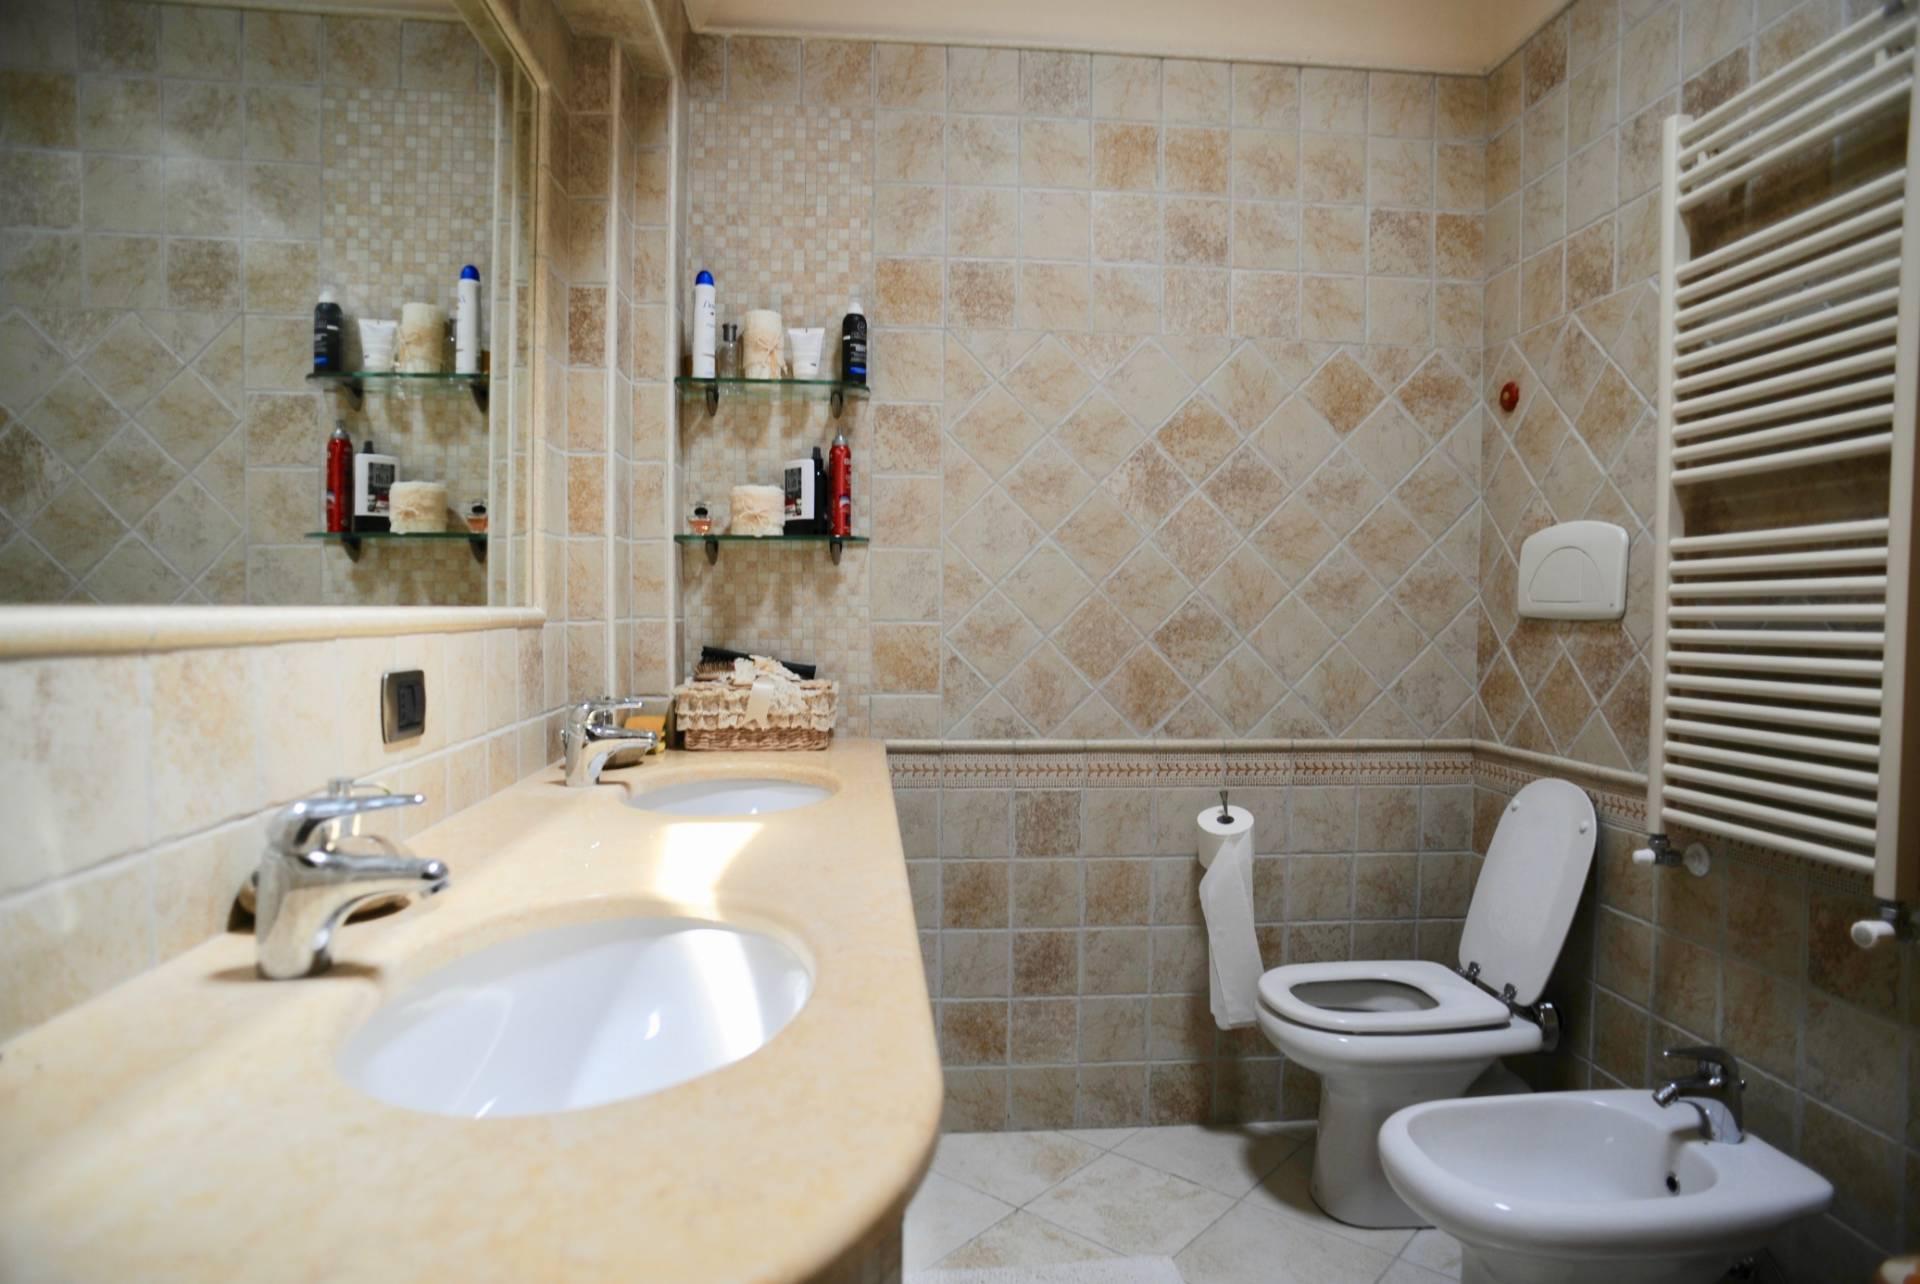 Villa in Vendita a Padenghe Sul Garda: 3 locali, 100 mq - Foto 11